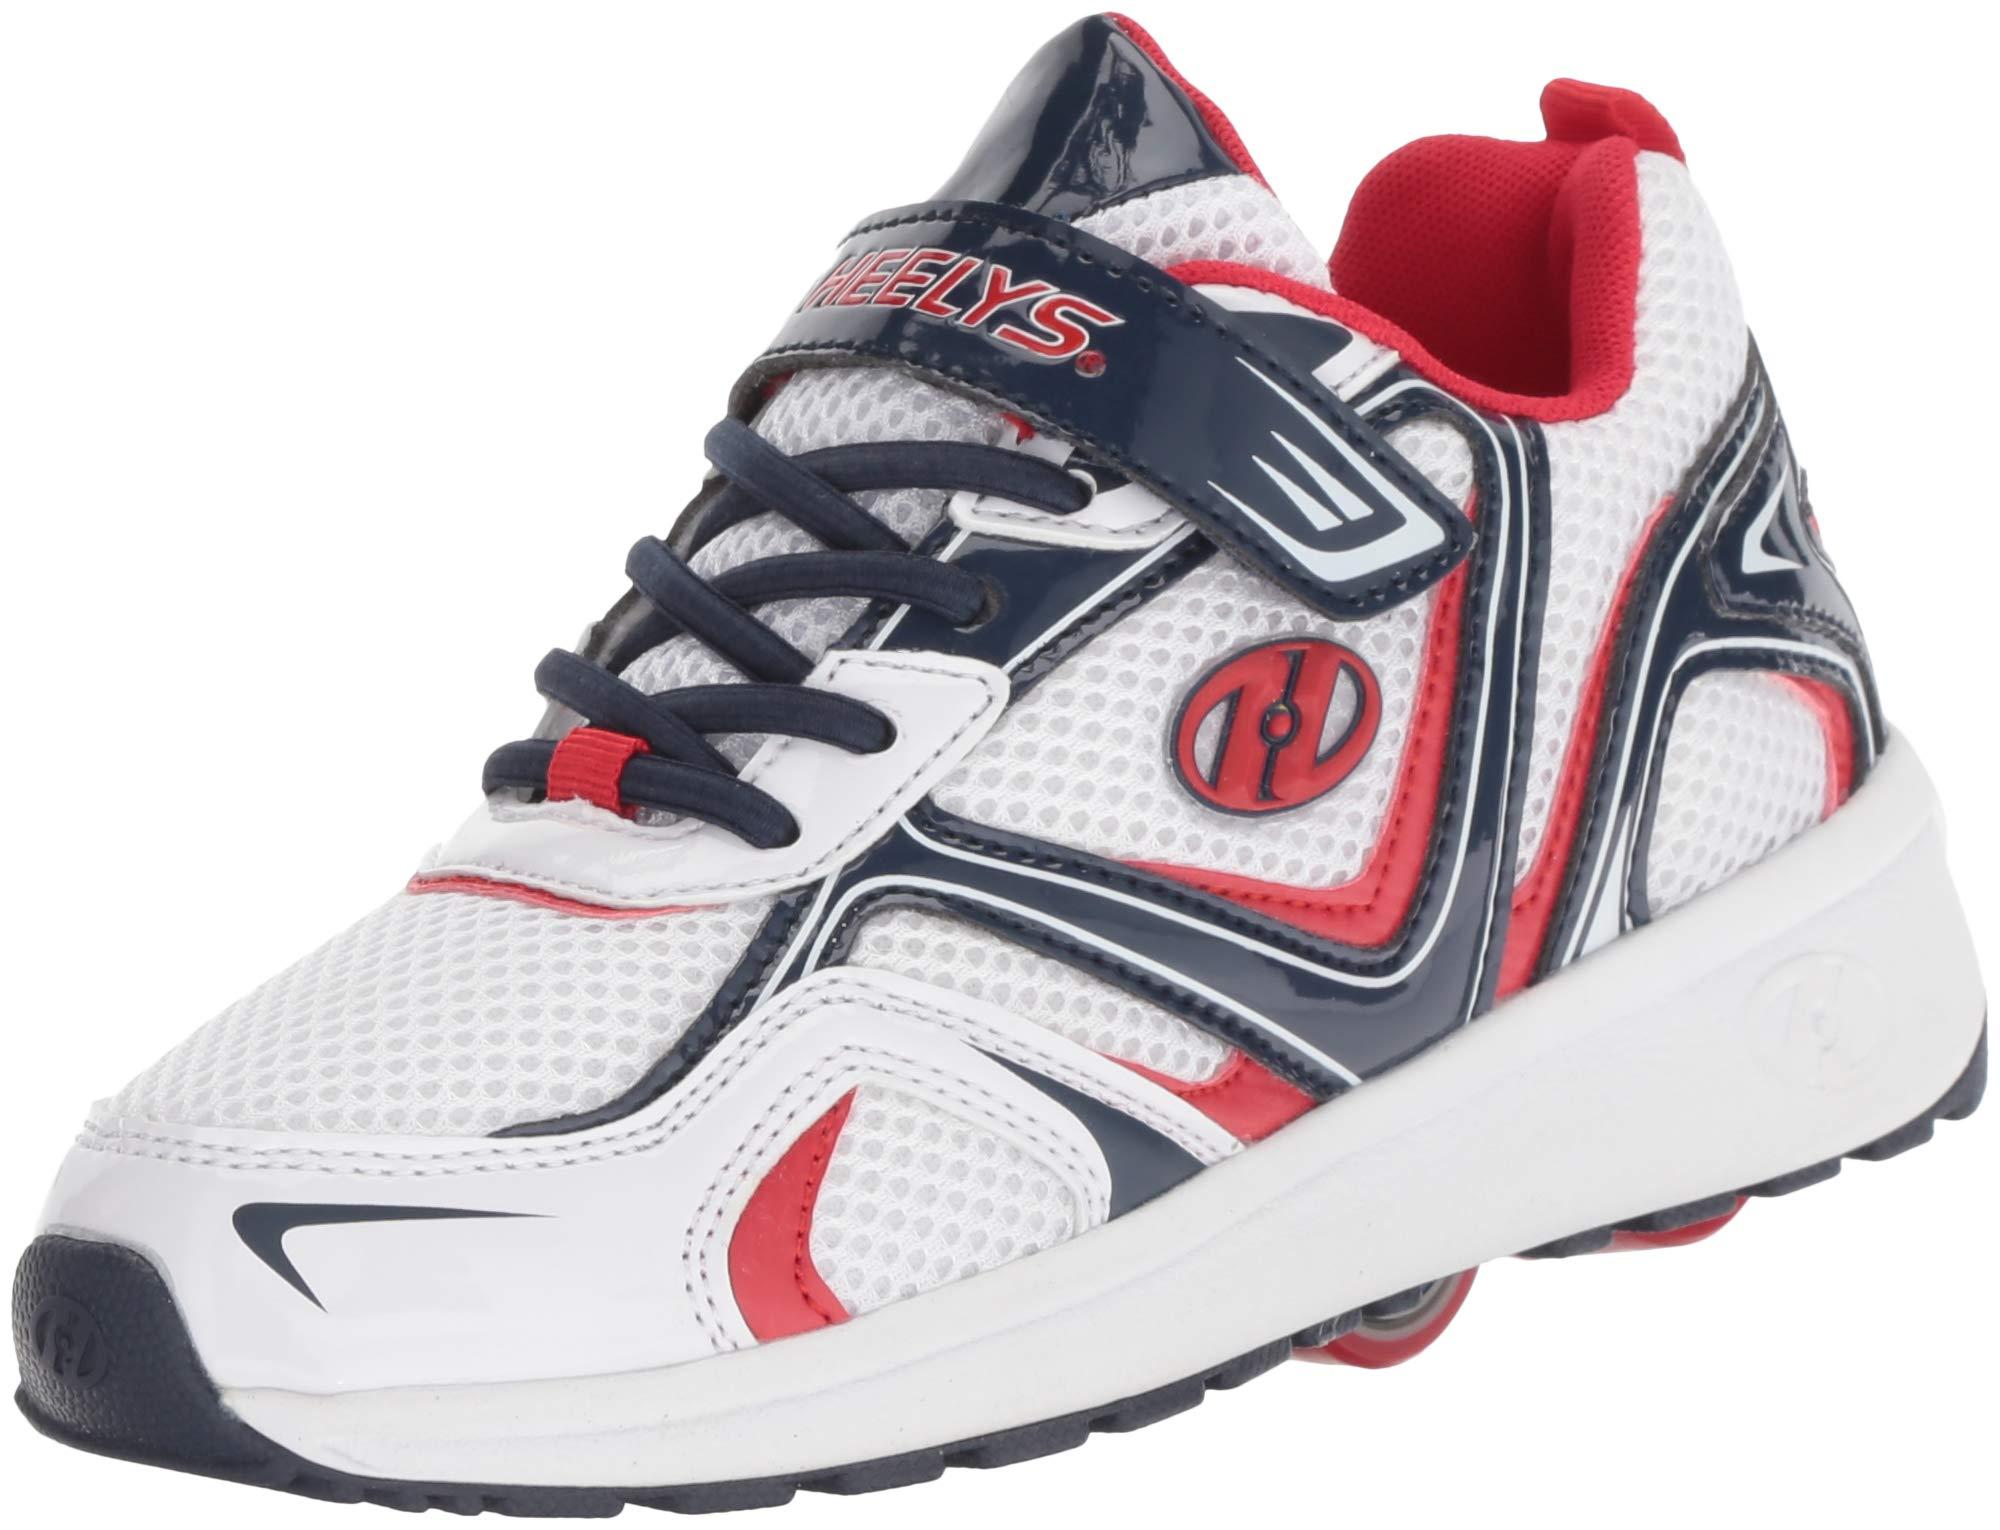 Heelys Boys' Rise X2 Tennis Shoe, White/Black/red, 2 M US Little Kid